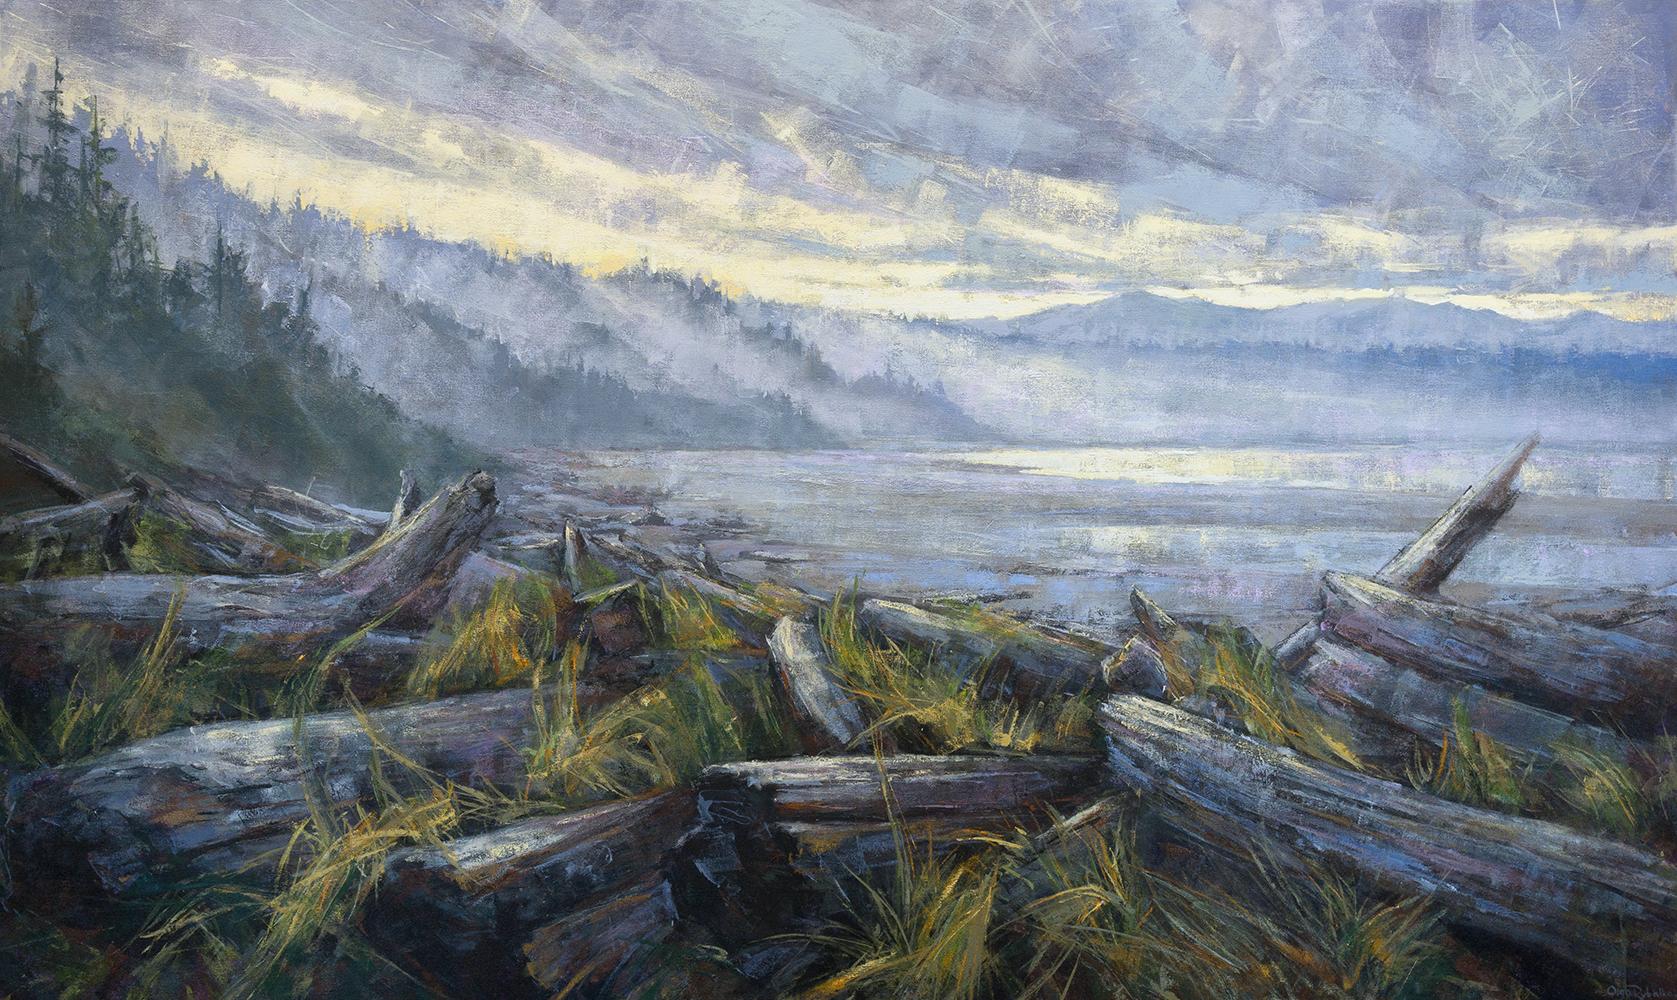 olga rybalko art - pacific rim - landscape painting-5.jpg